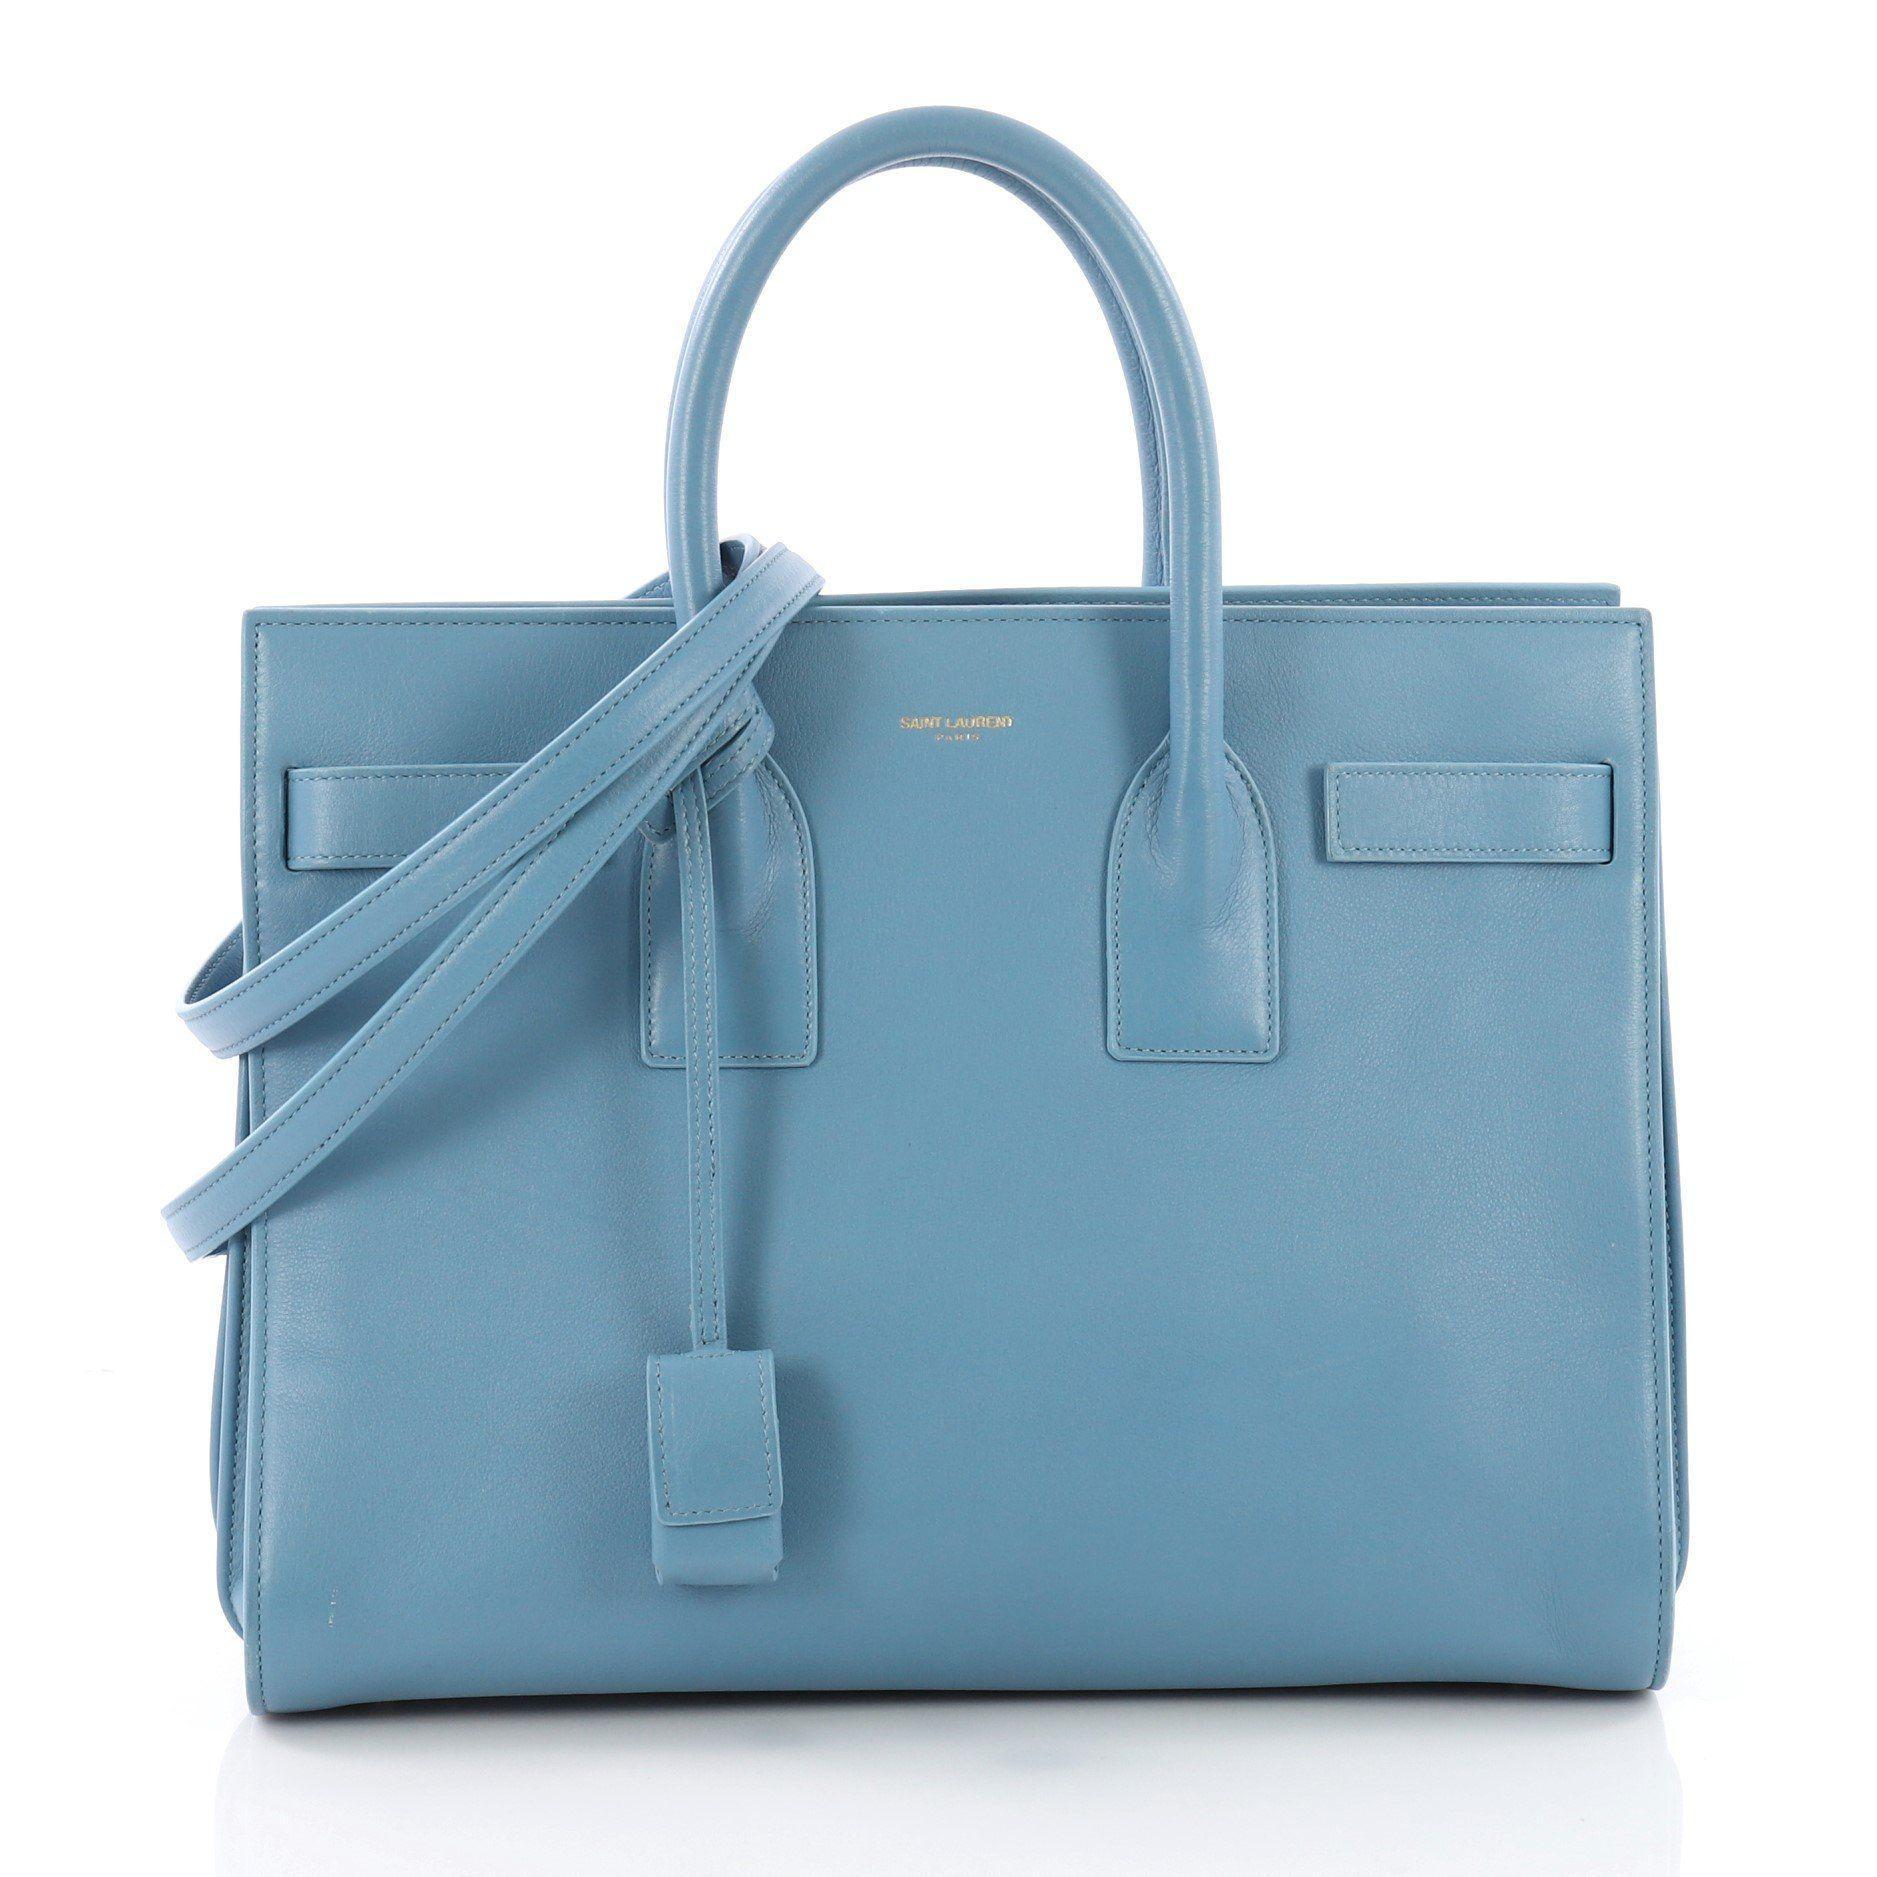 defbdb4a137 saint-laurent--Pre-Owned-Sac-De-Jour-Handbag-Leather-Small.jpeg